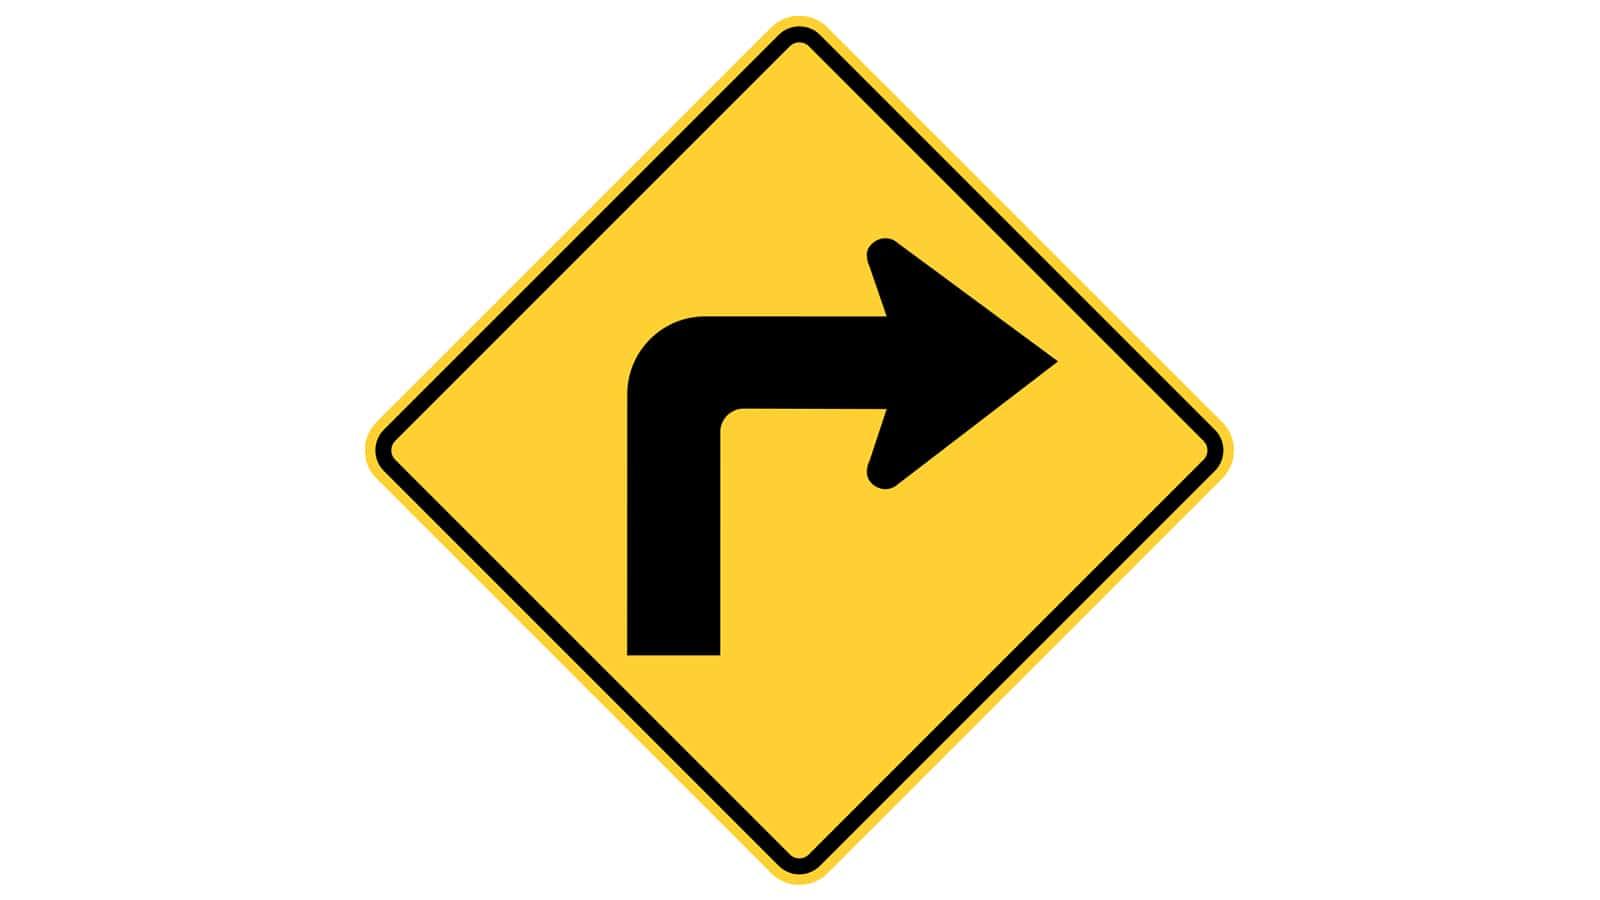 Warning sign turn right